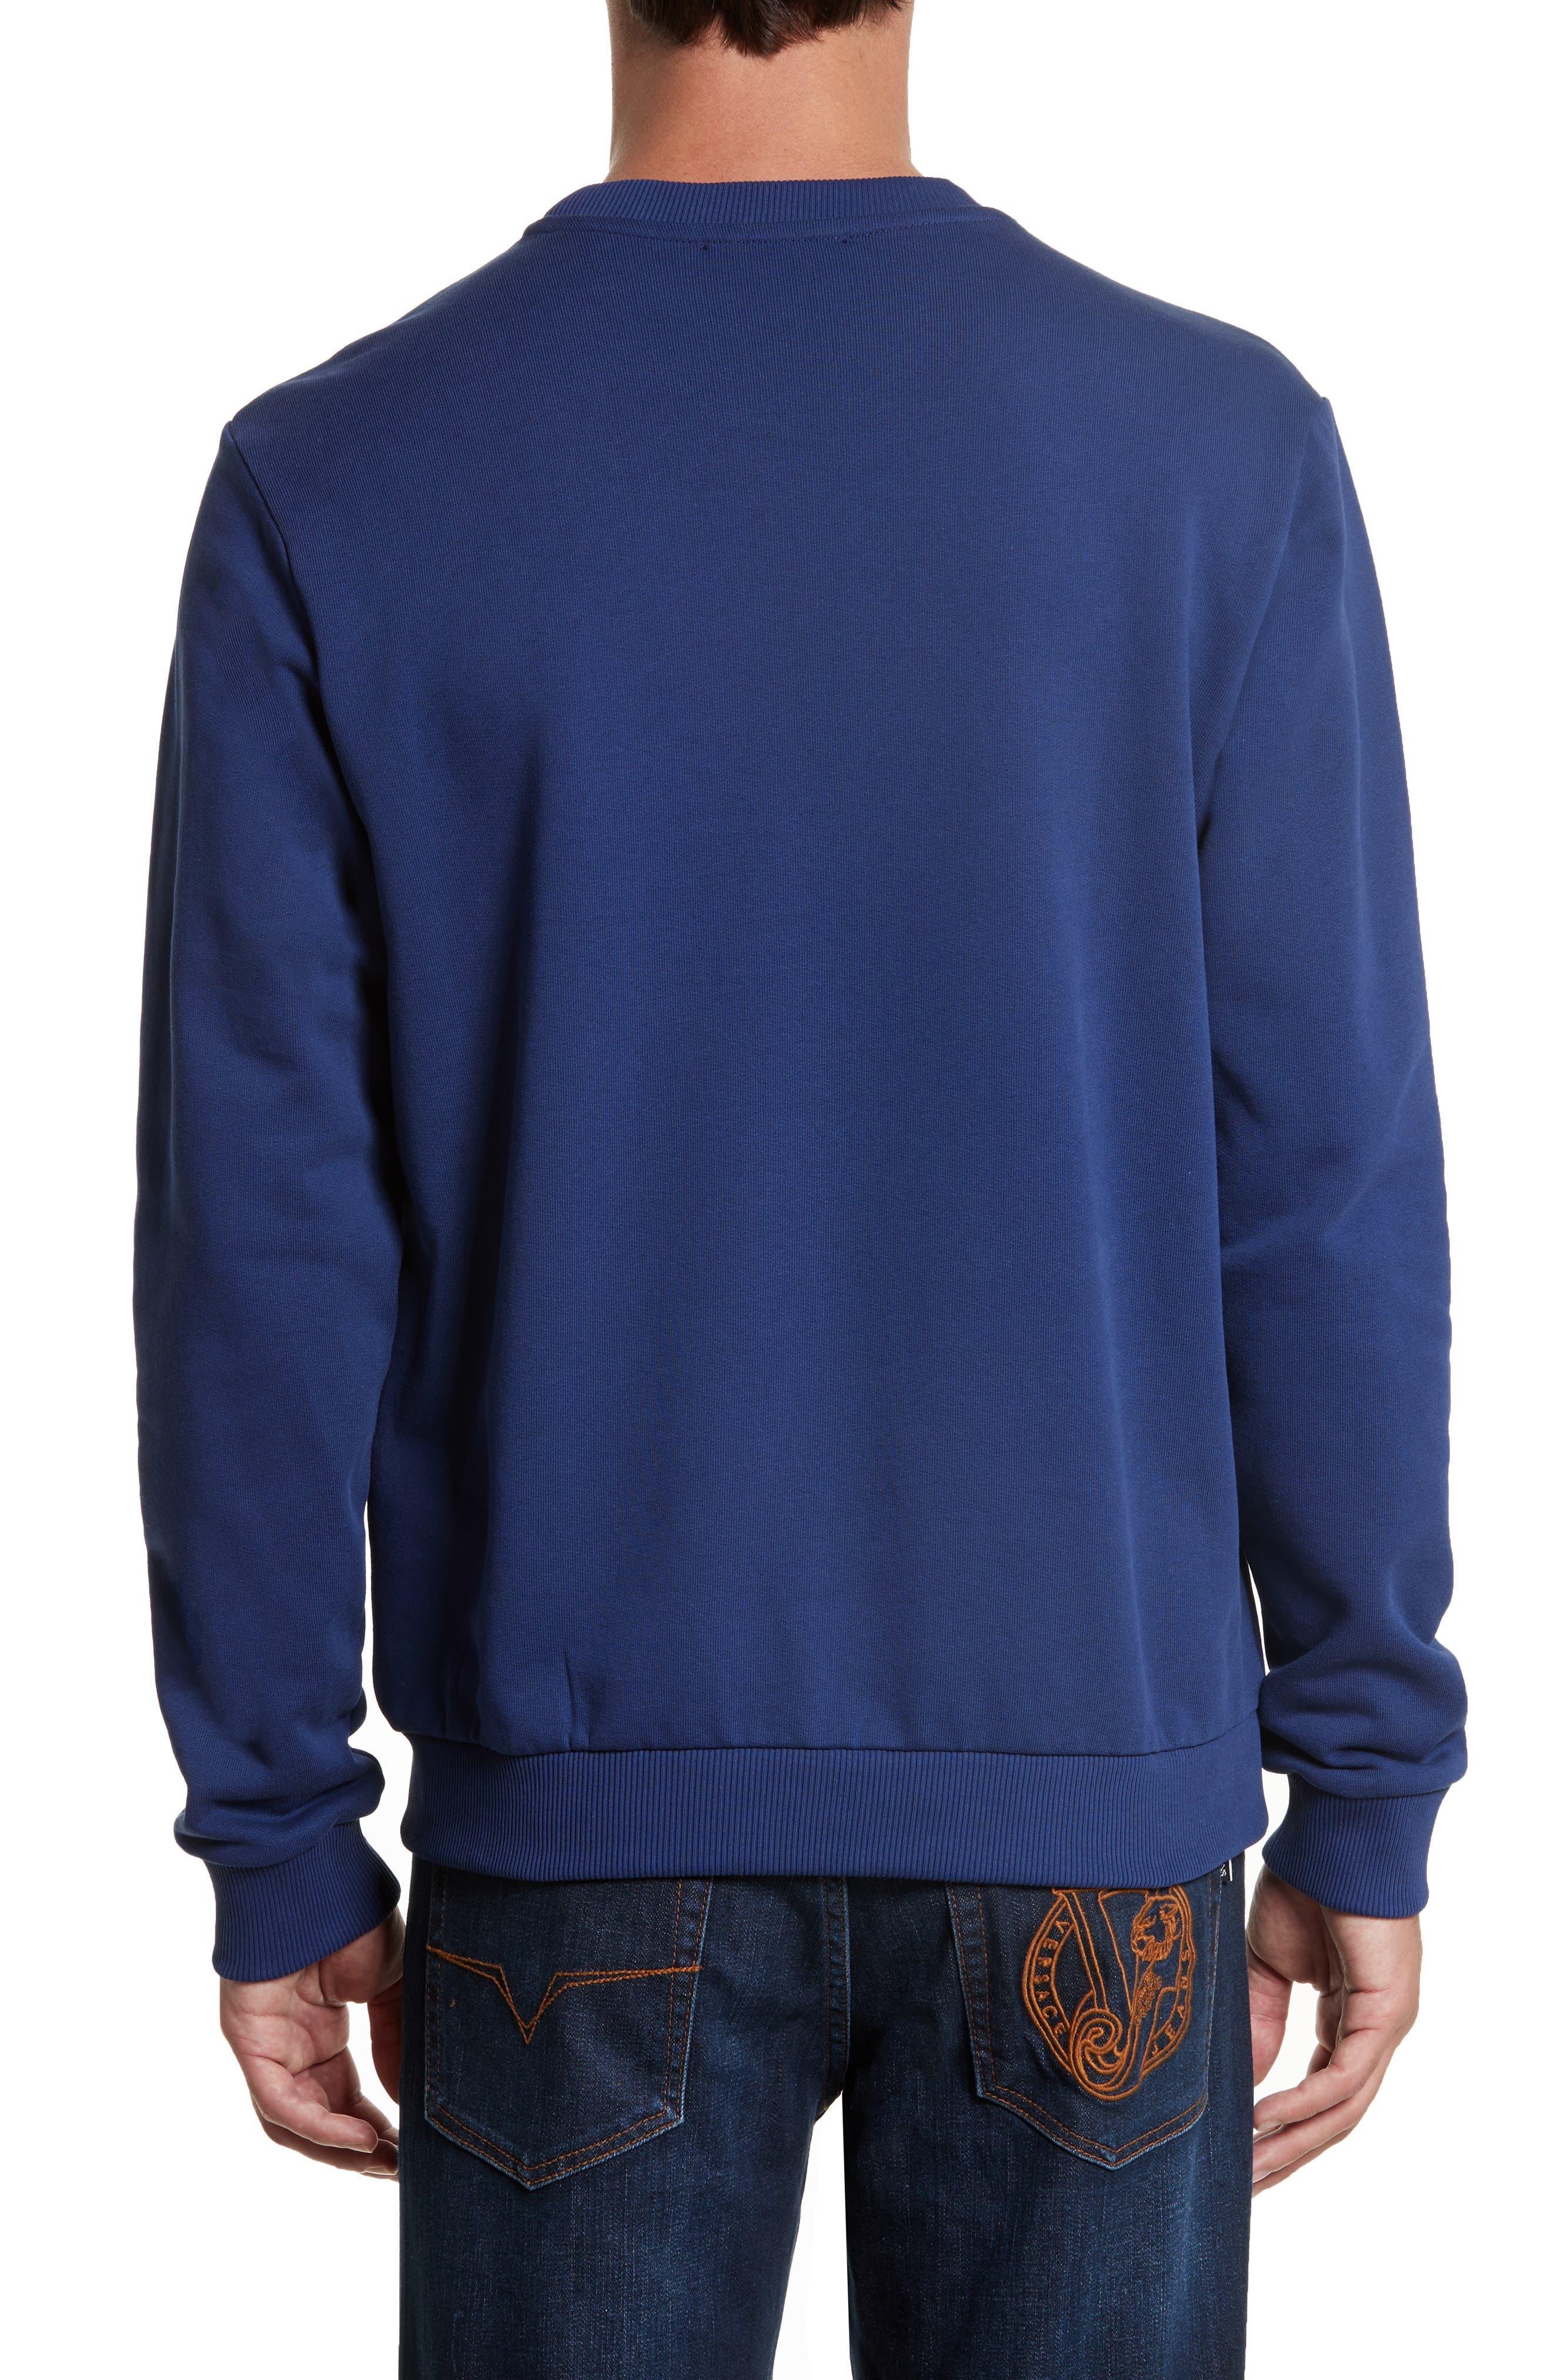 Alternate Image 2  - Versace Jeans Embroidered Crewneck Sweatshirt